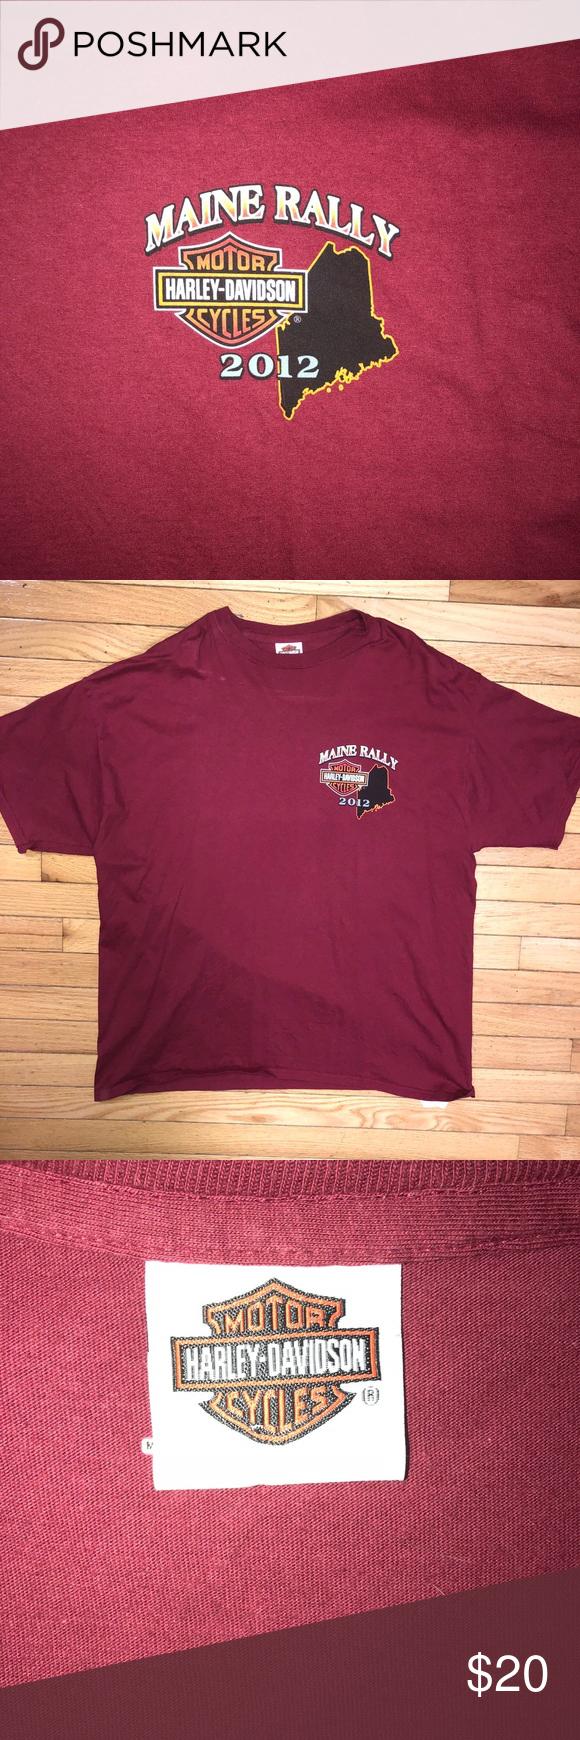 Harley Davidson Shirt Harley Davidson Shirt Shirts Harley Davidson